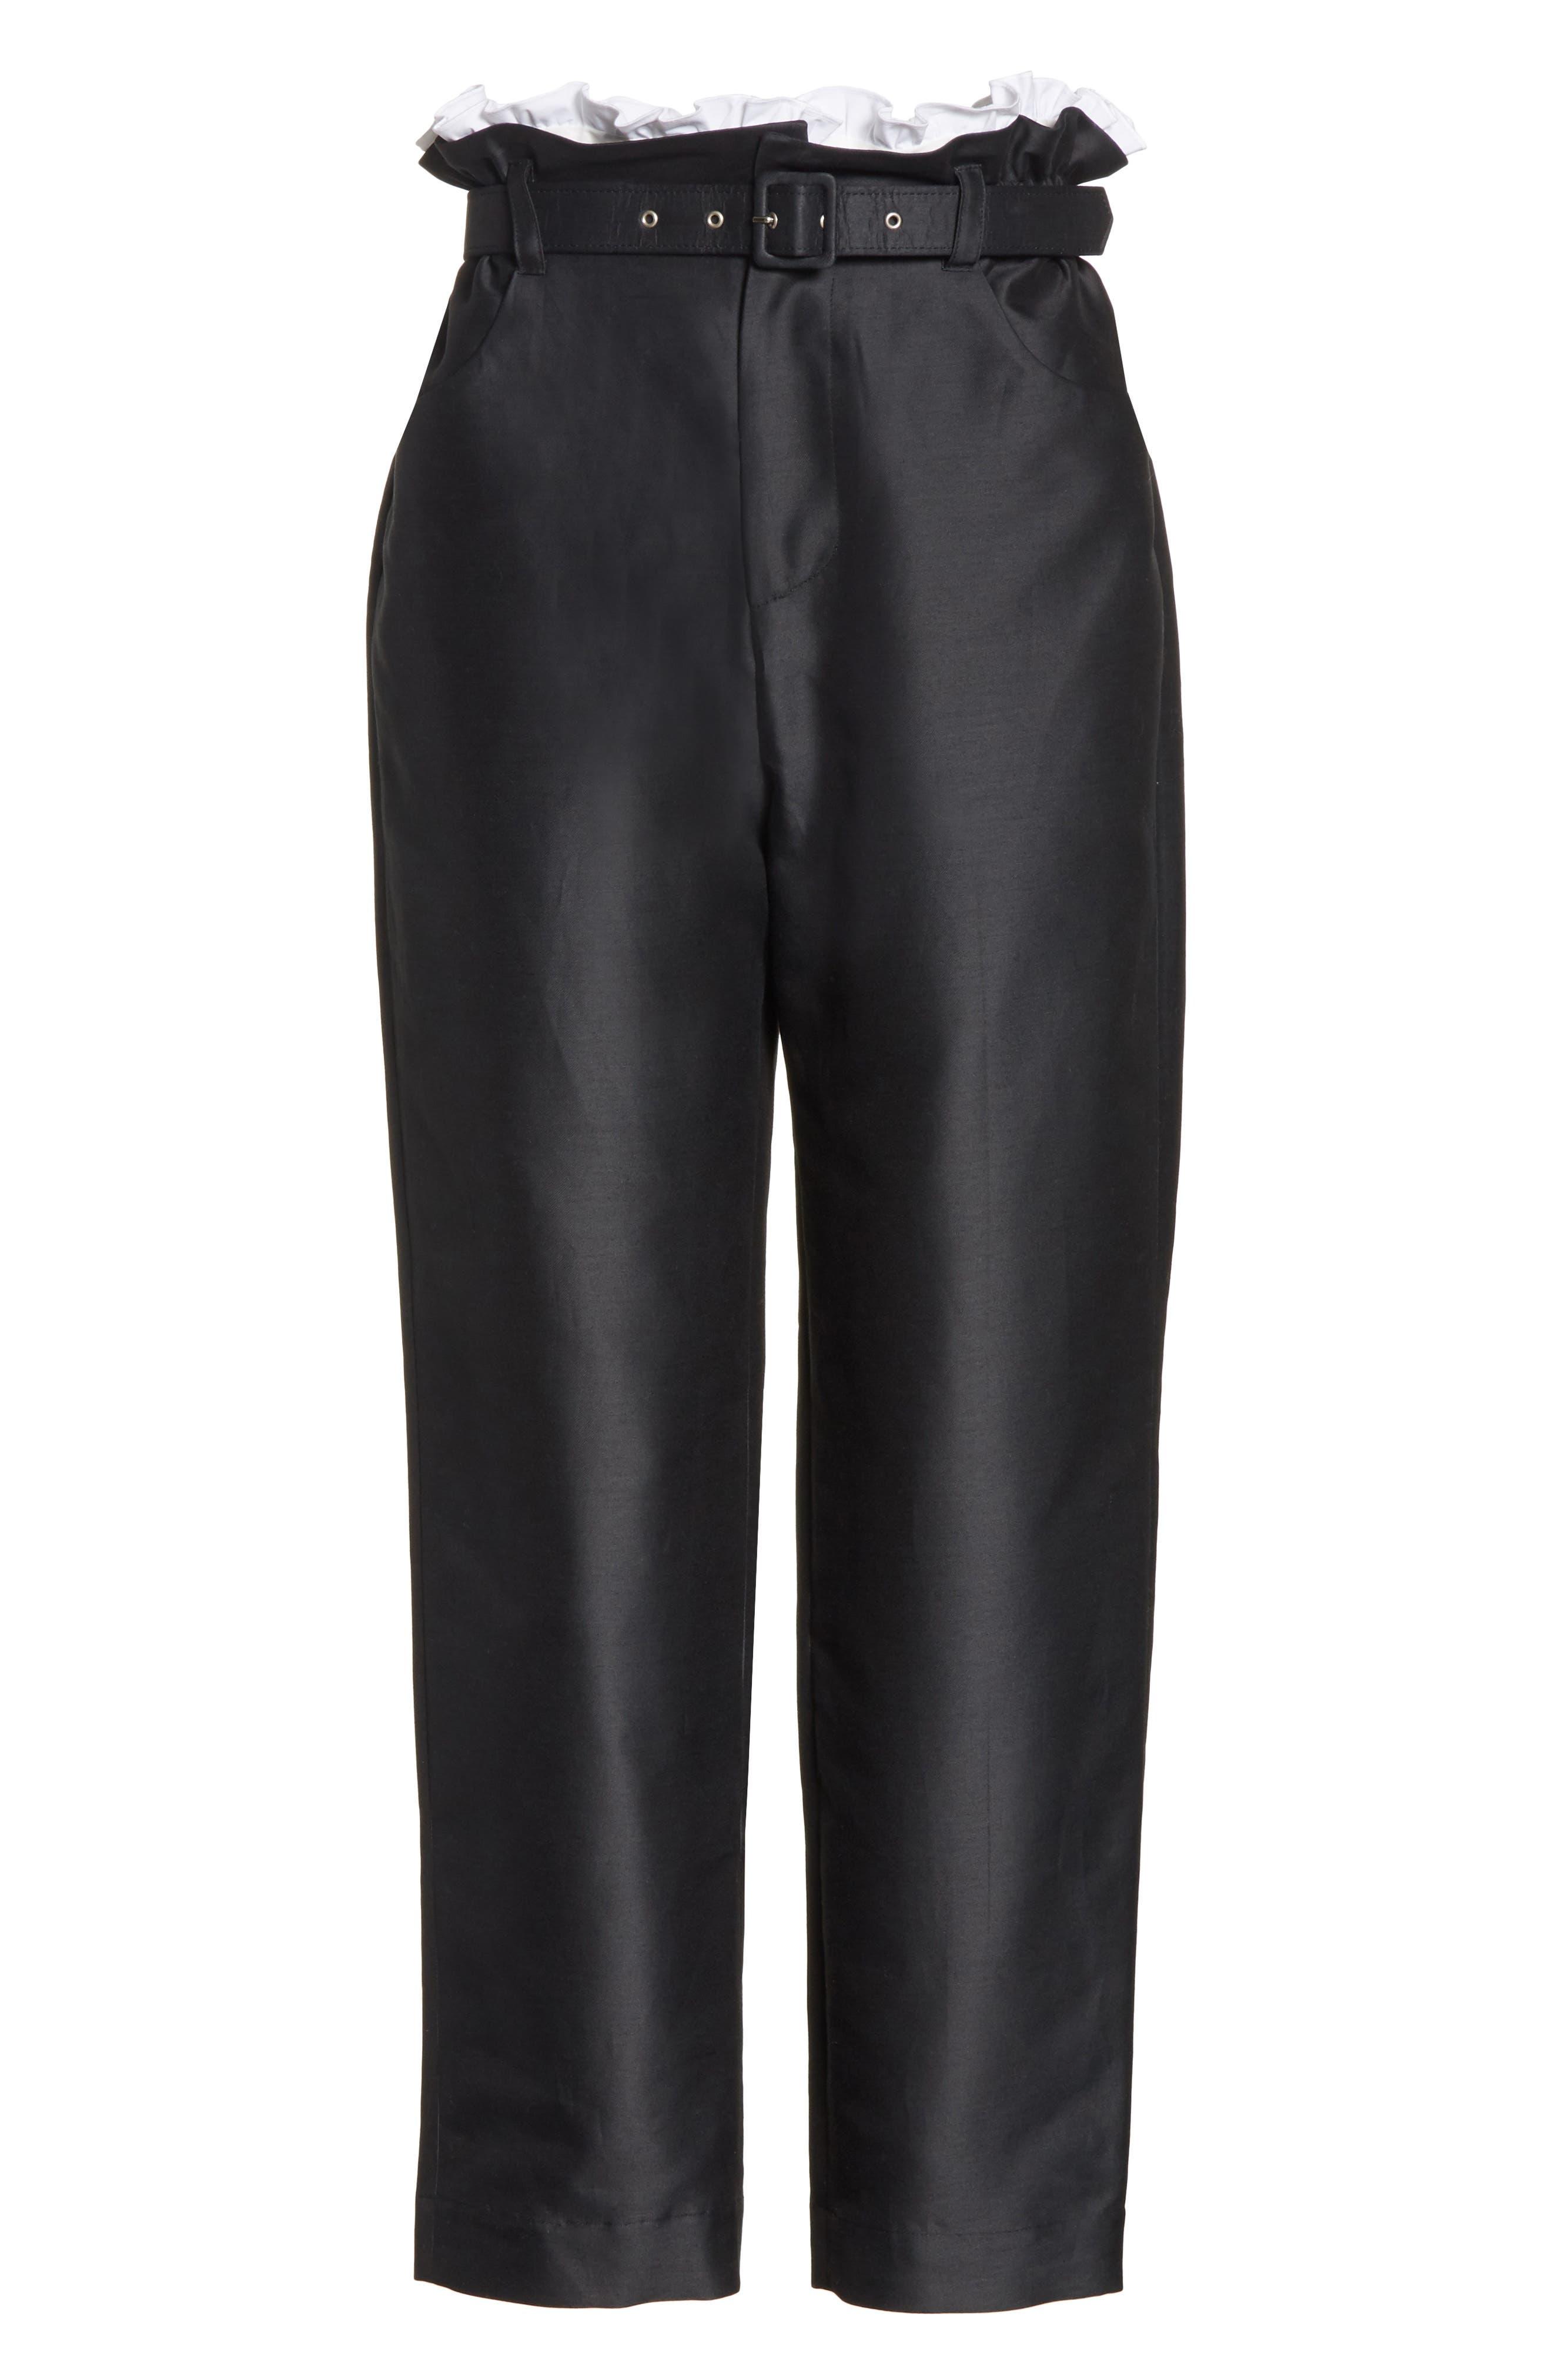 Paperbag Cotton & Silk Trousers,                             Alternate thumbnail 6, color,                             001